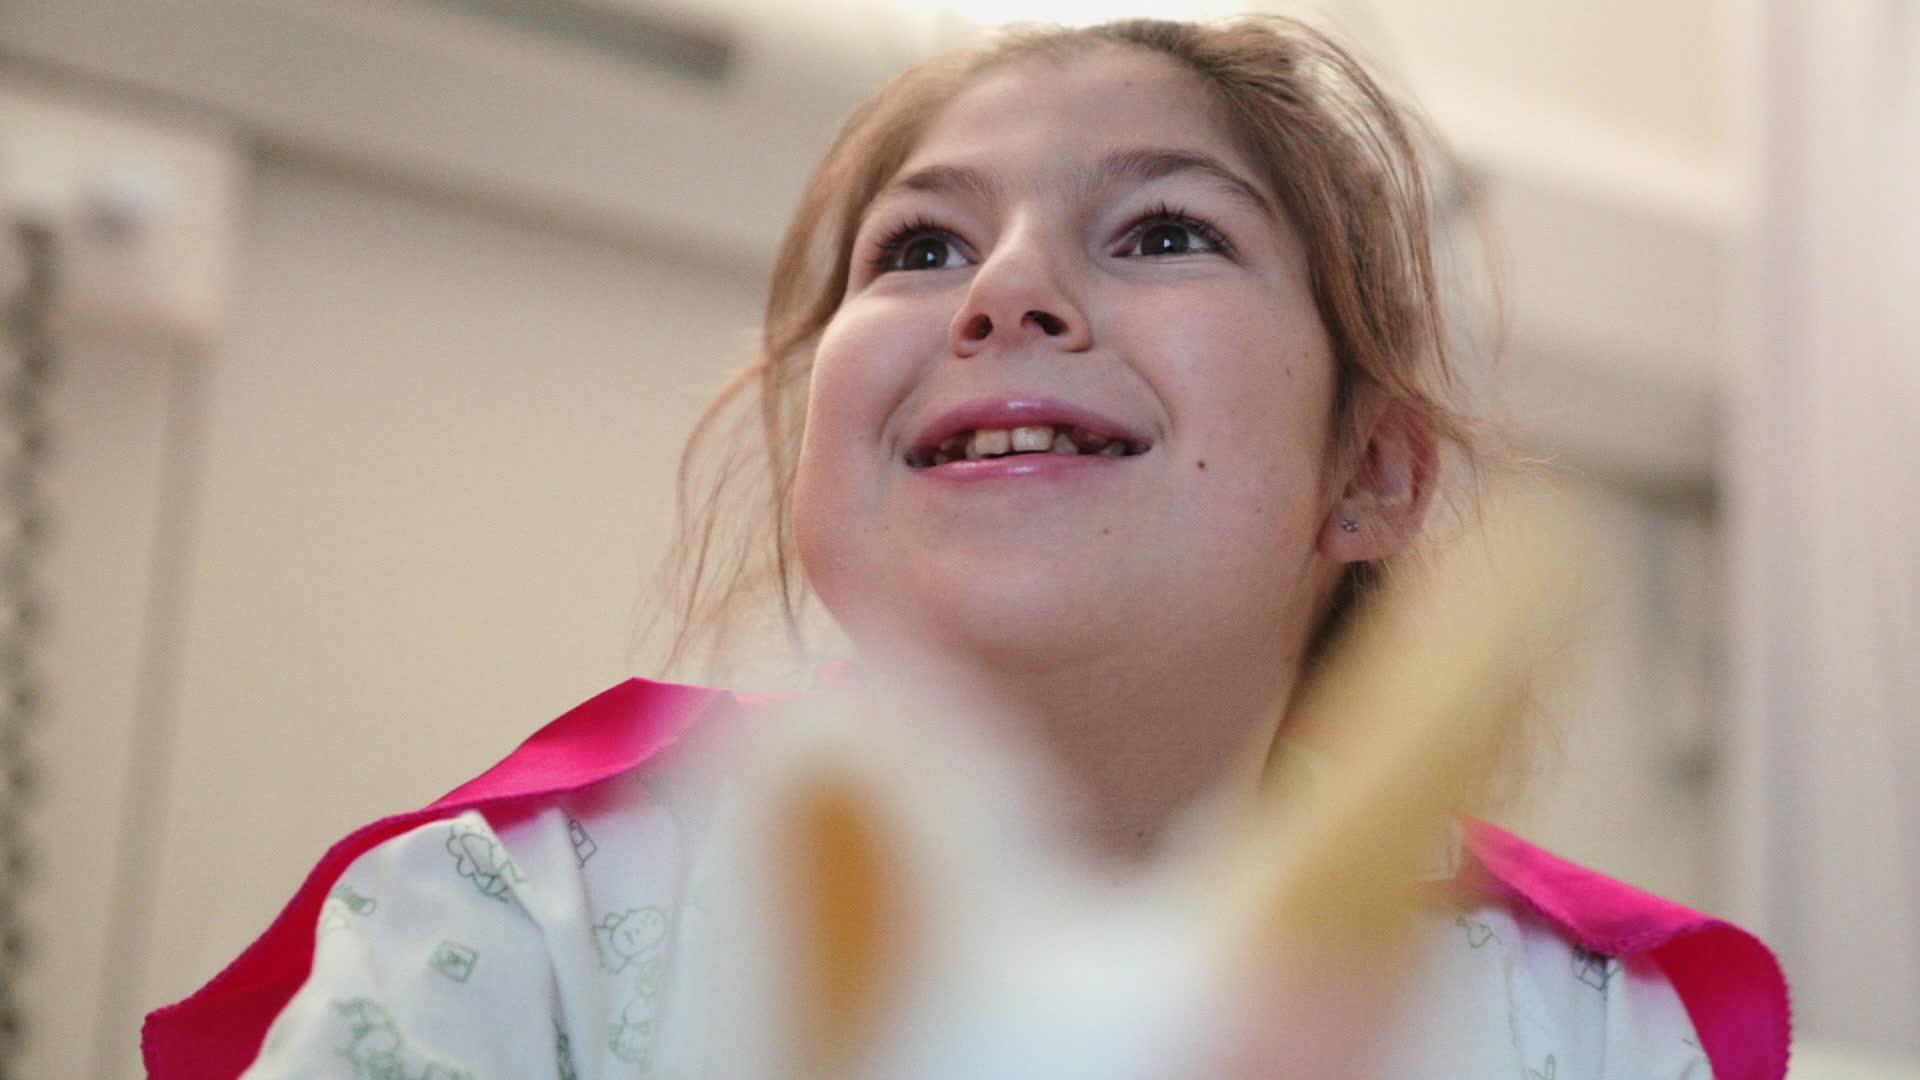 Un niña ibicenca de 11 años busca un donante de médula ósea